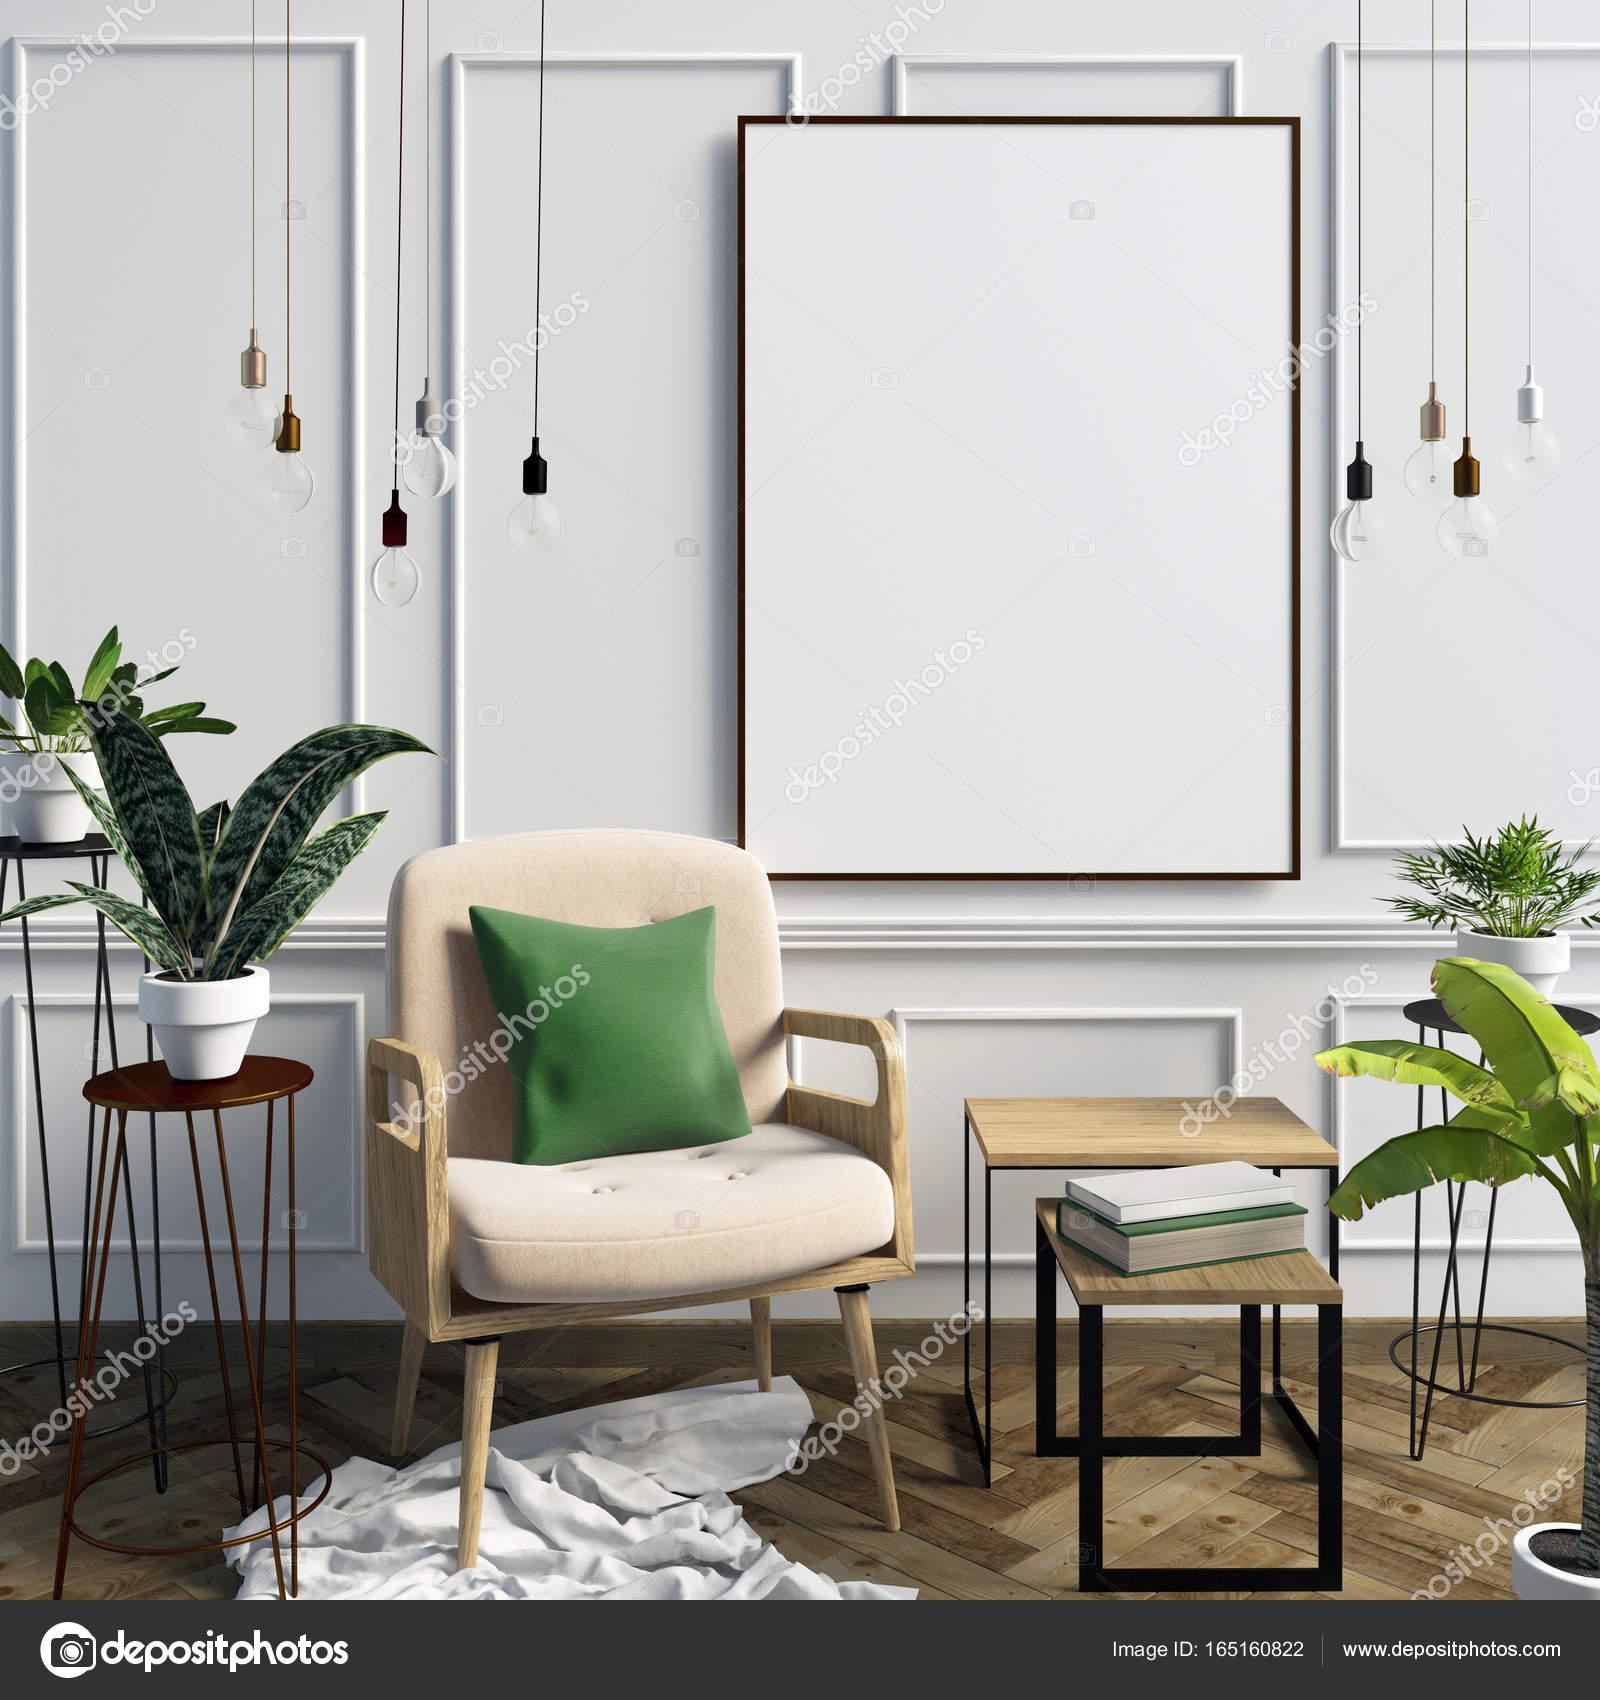 3D Illustration, modernes Interieur mit Rahmen, Poster und Stuhl. p ...